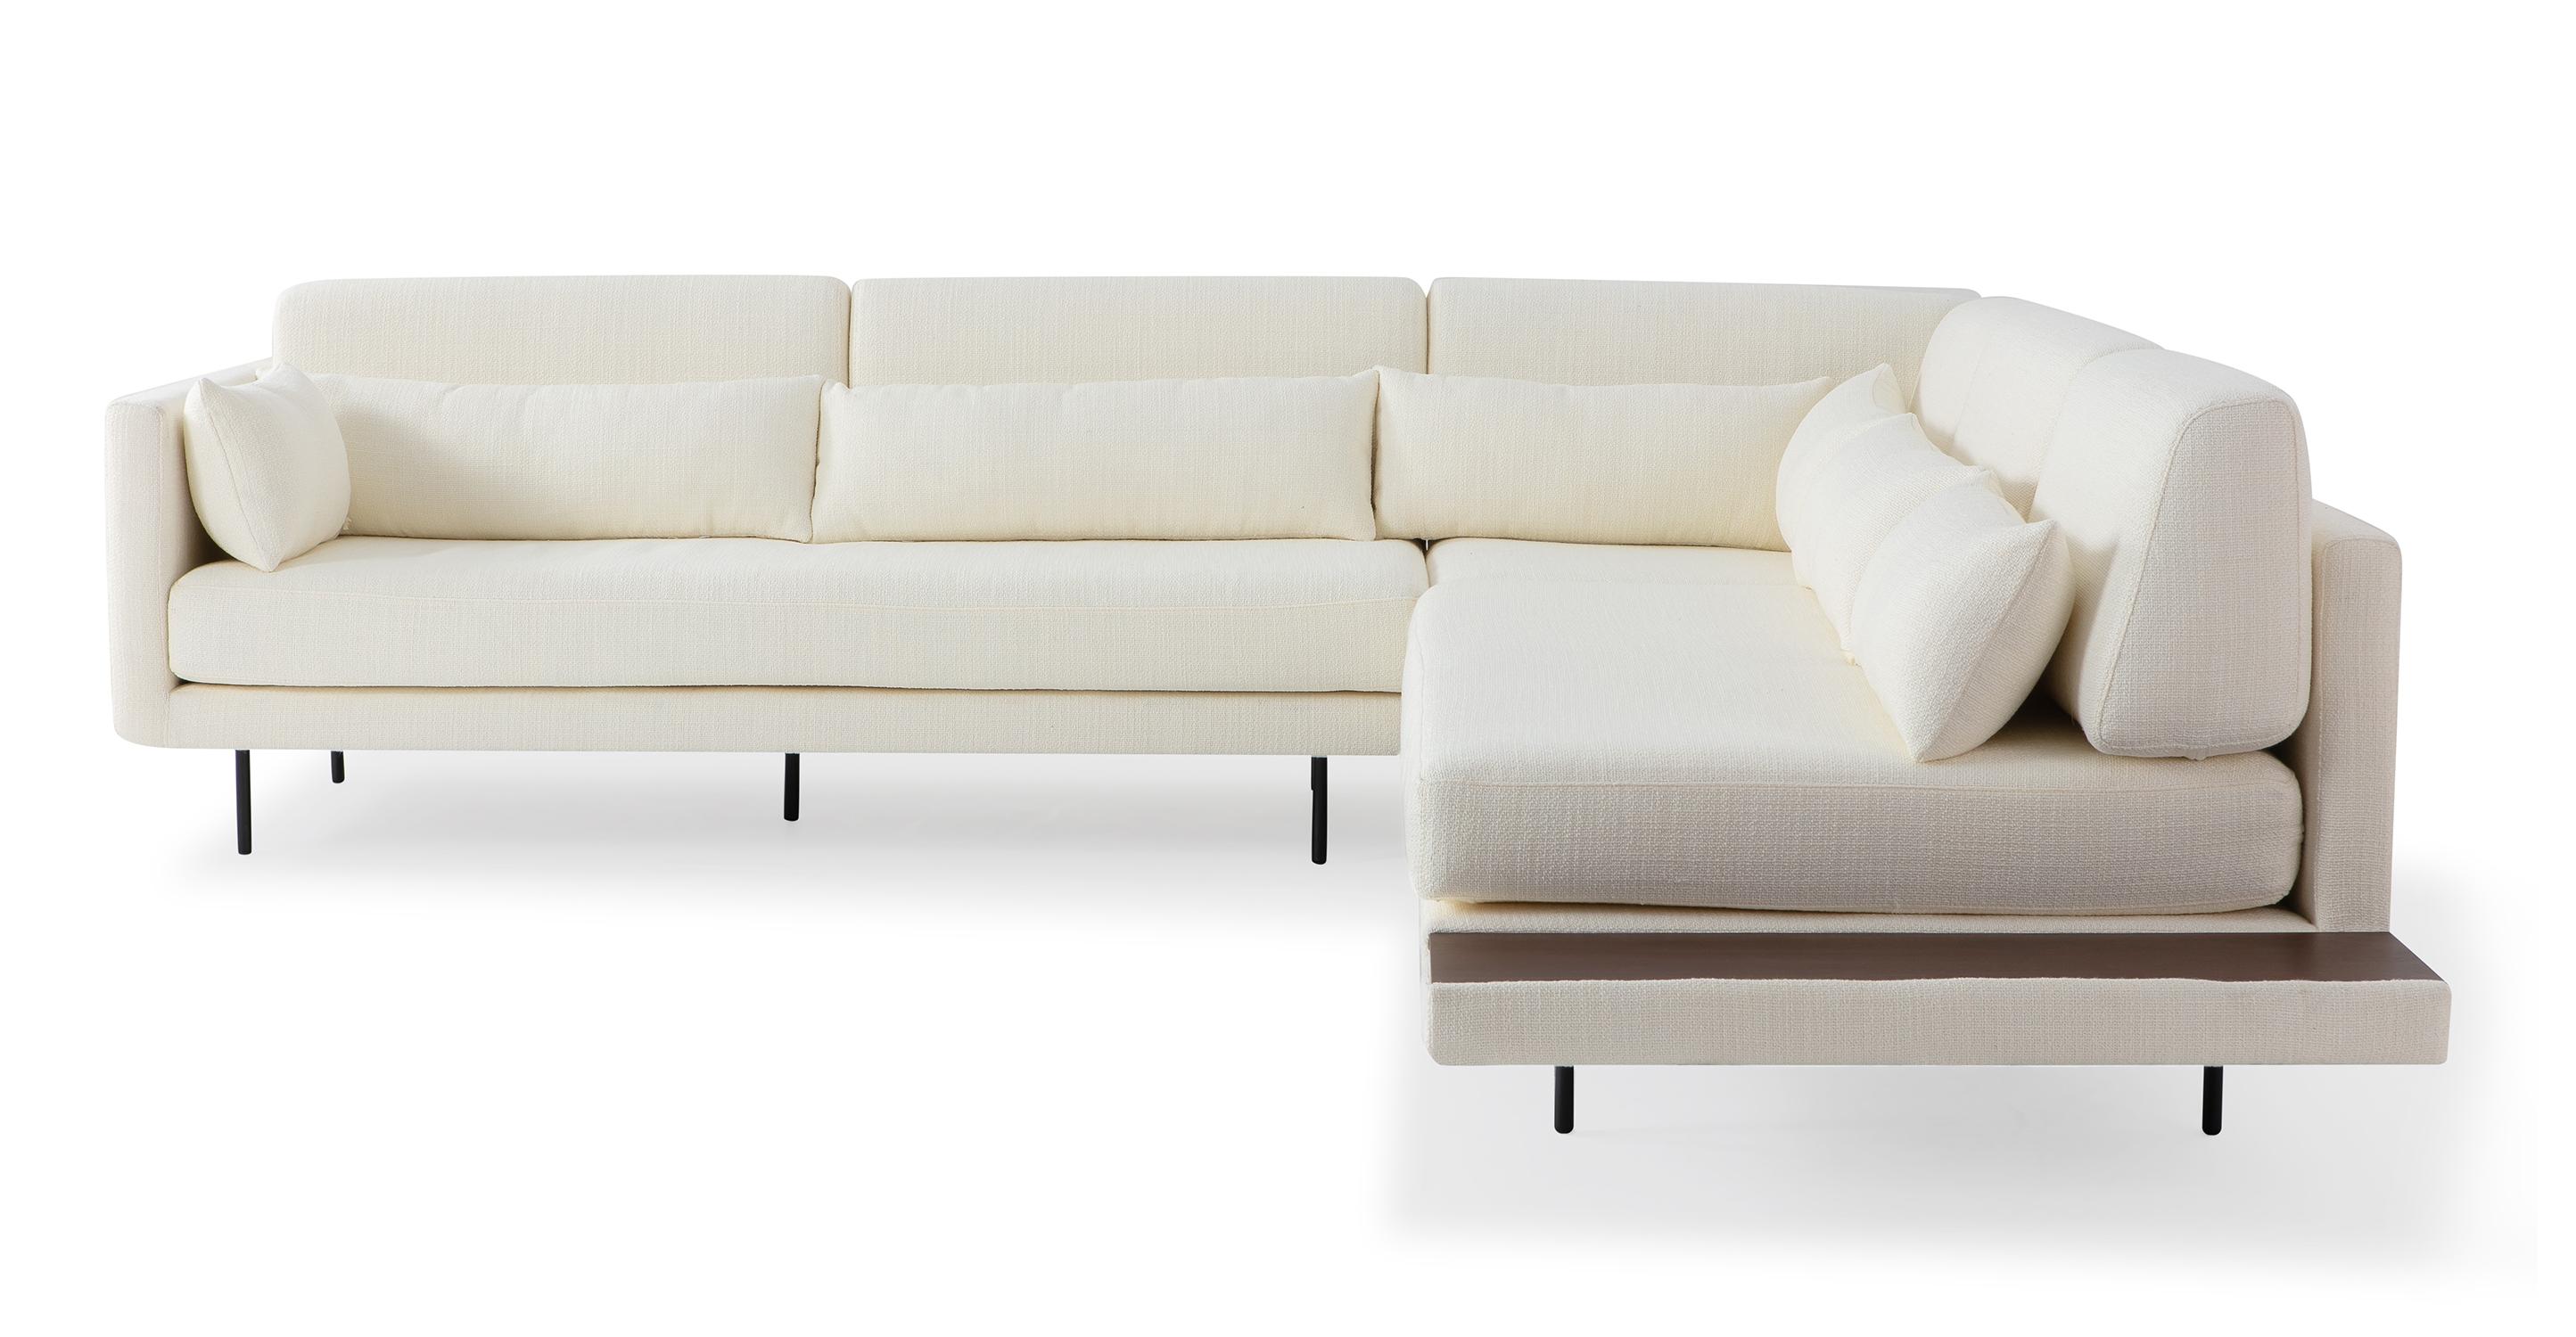 "Davenport 110"" Fabric L-Corner Sofa Sectional, Jour Boucle"